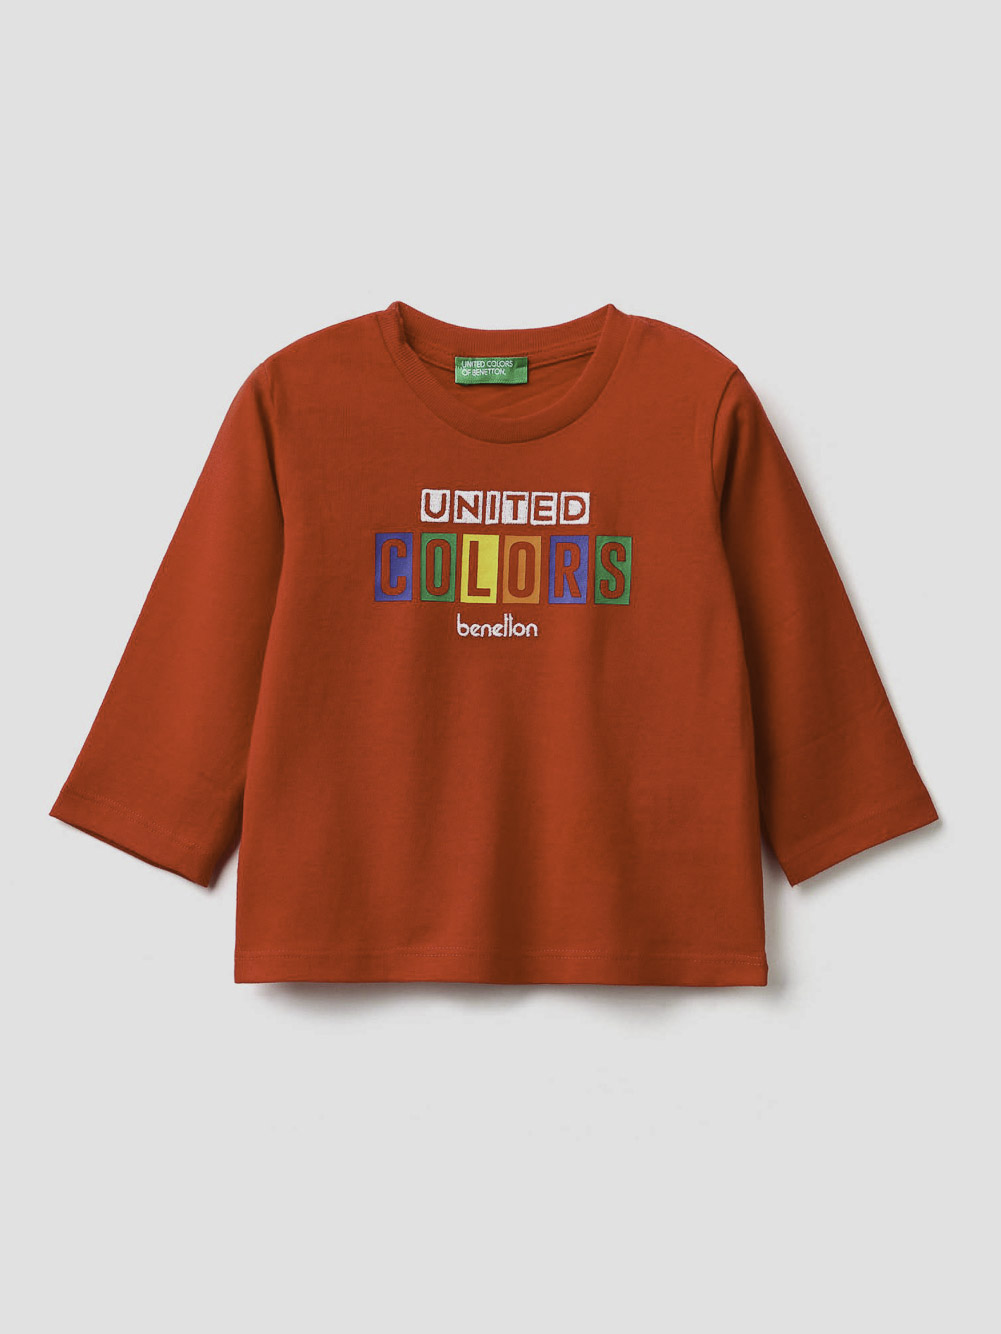 012 BENETTON T-shirt με λογότυπο 3ATNC14W1 20A015